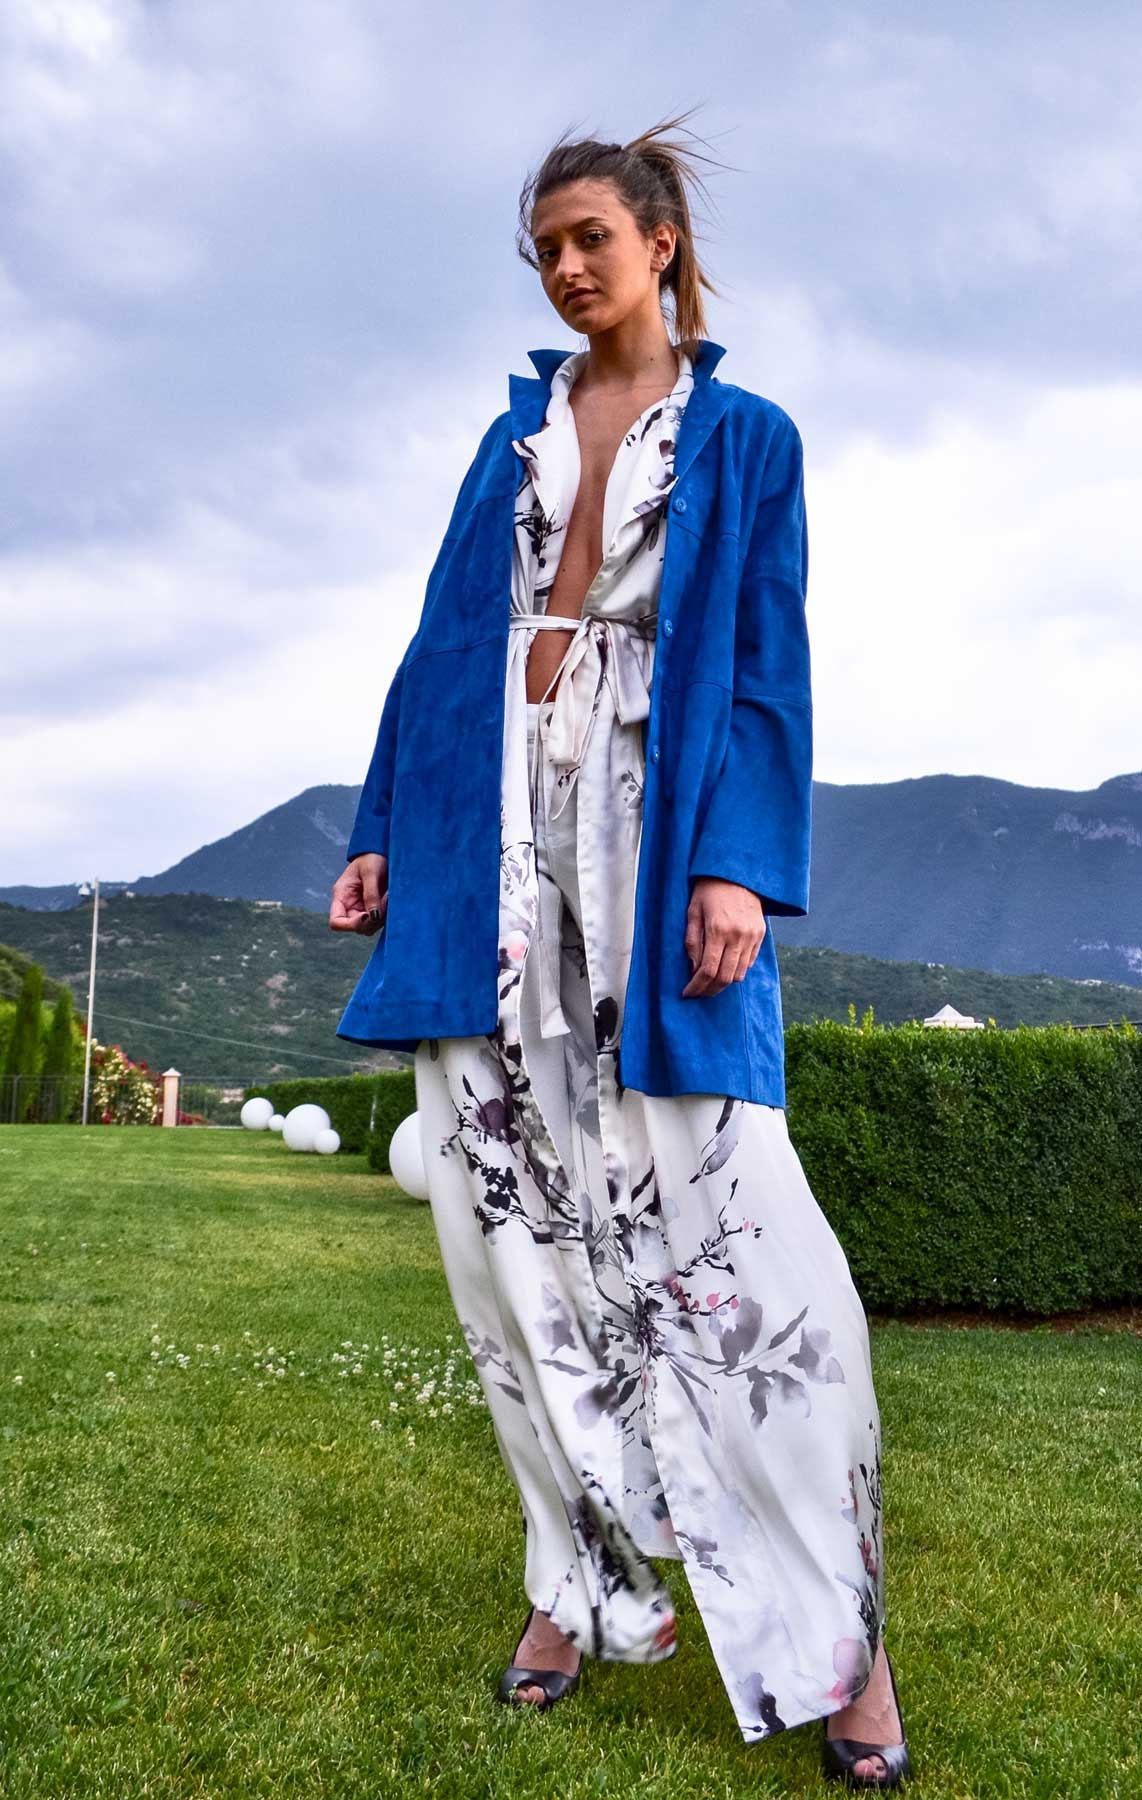 matteo-perin-women-clothing-dress-007.jpg